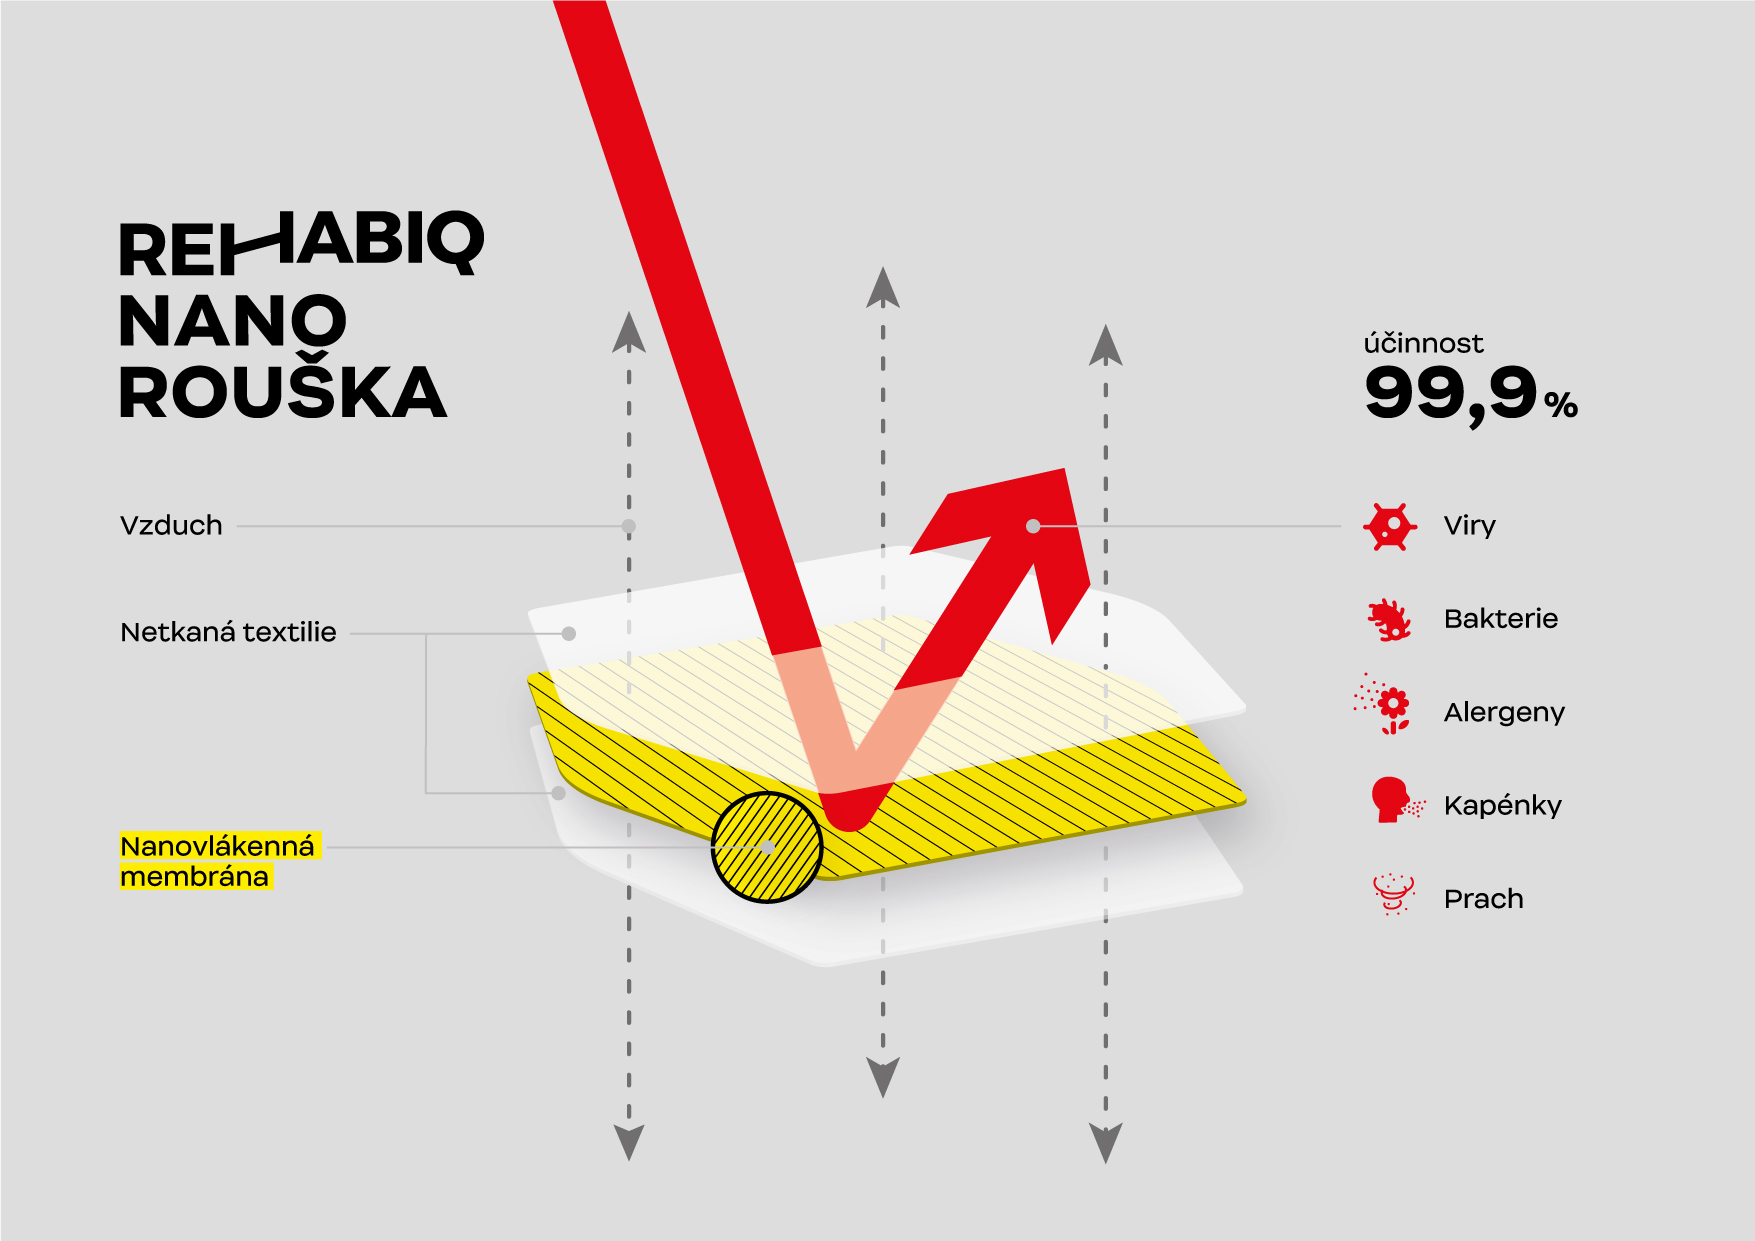 Graf propustnosti Nano roušky Rehabiq s učinností 12 hodin